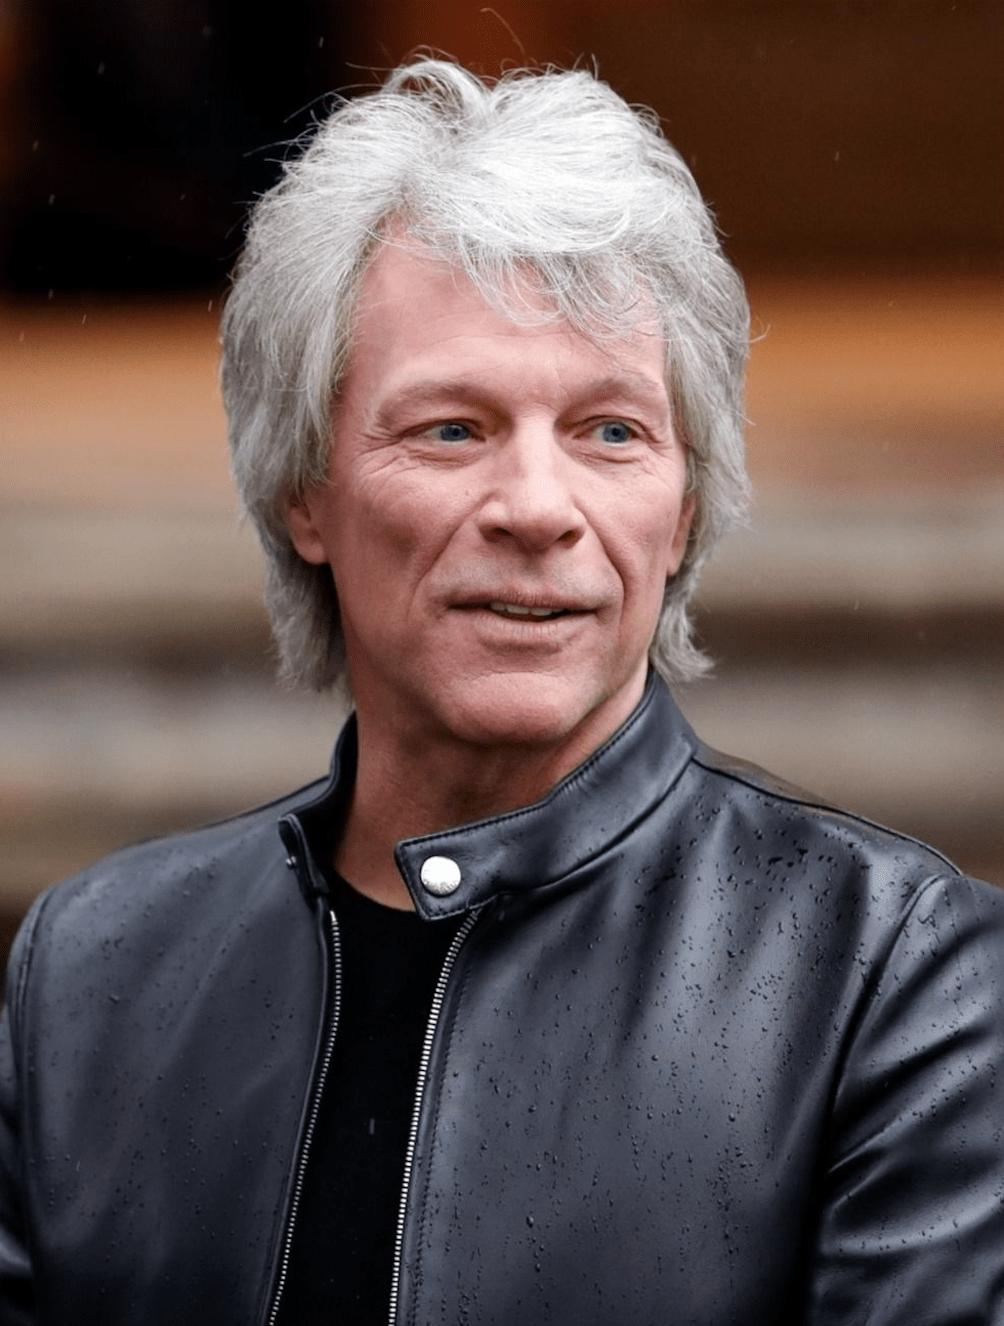 Jon Bon Jovi Endorses Use of Song by Hospitals